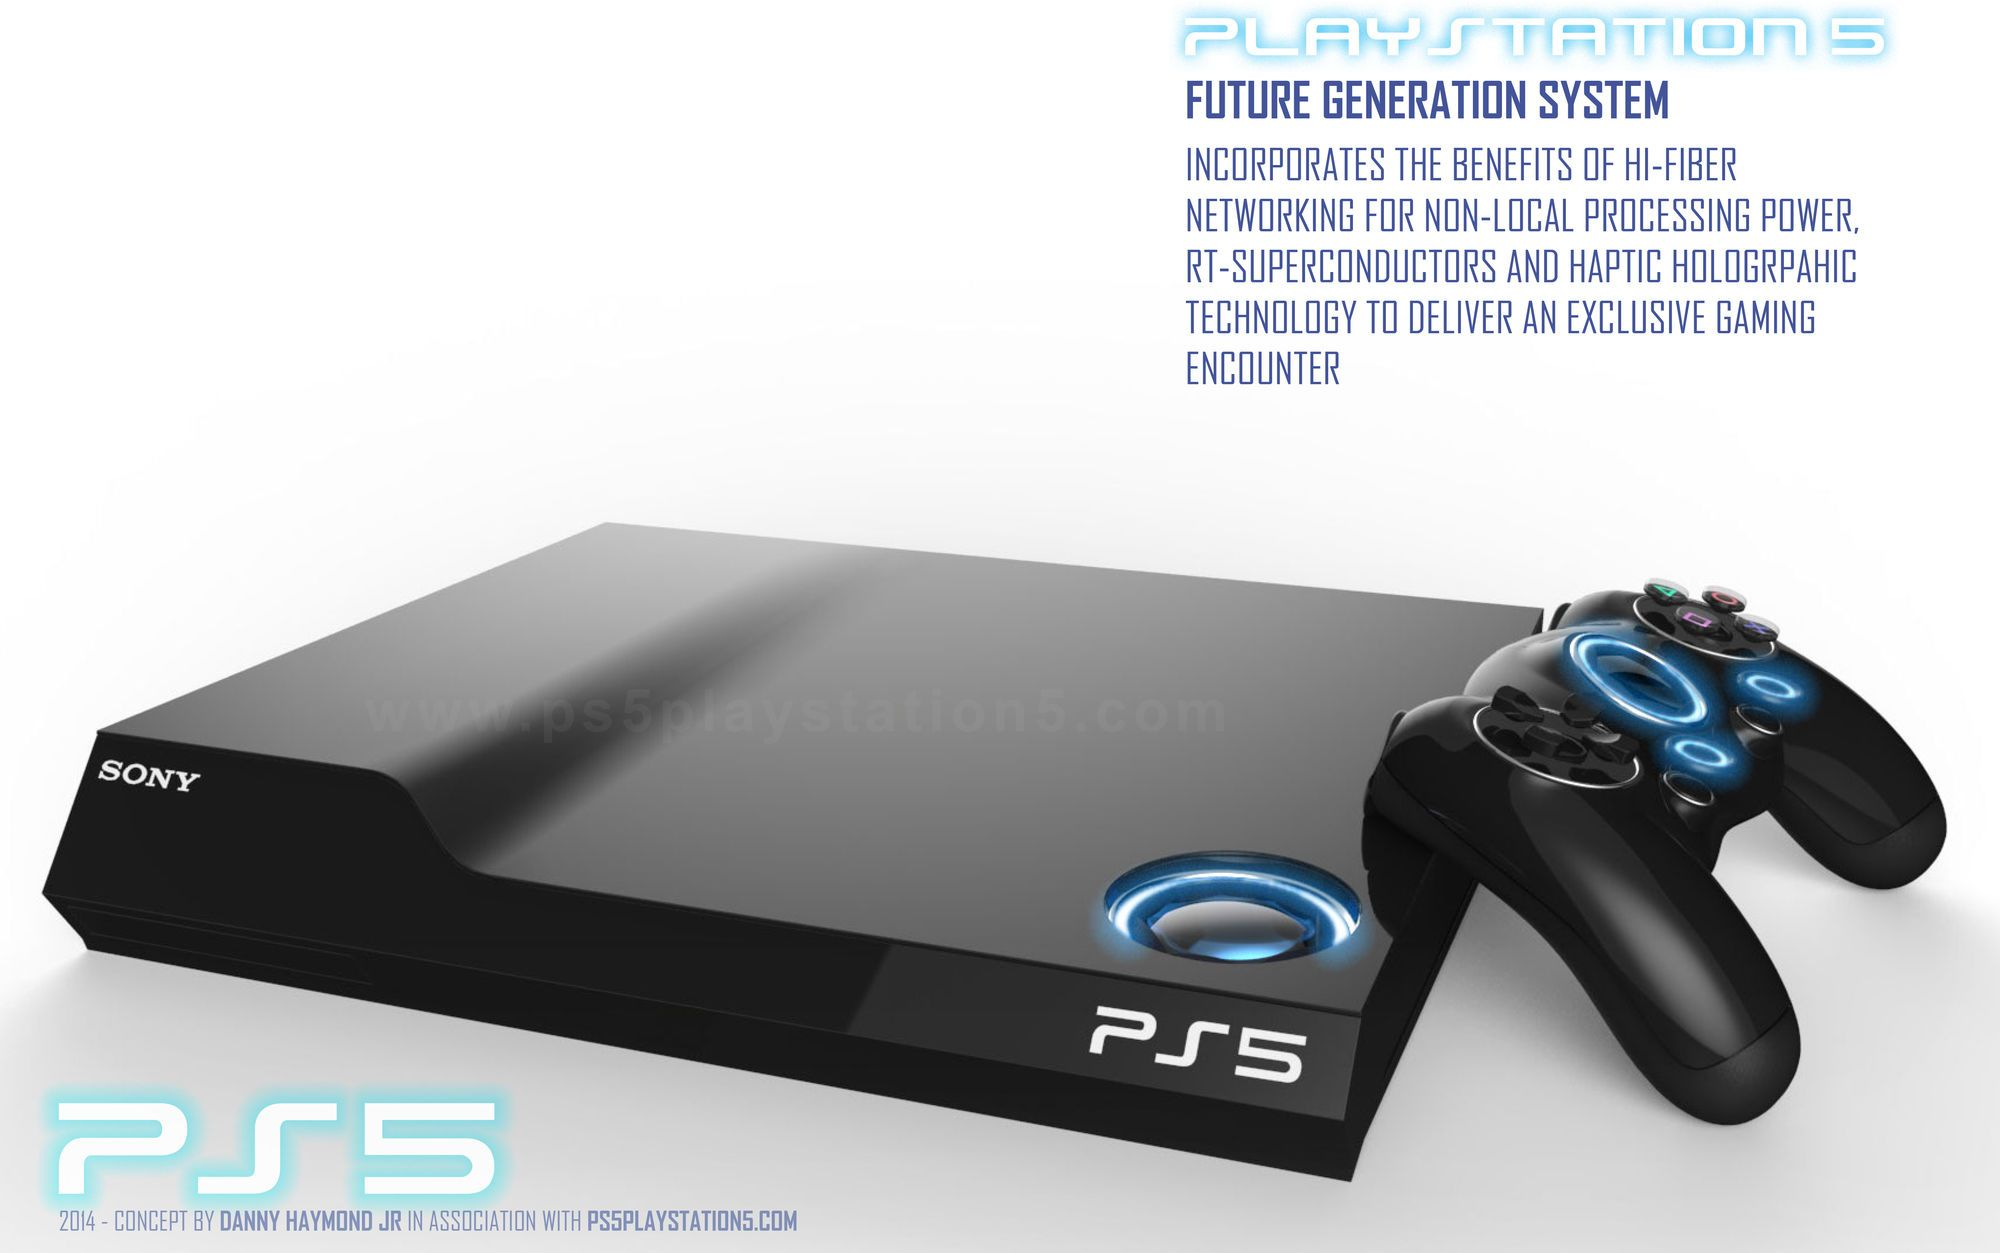 New Atari Console 2020 Image result for future game consoles 2020 | Luke Games Console in